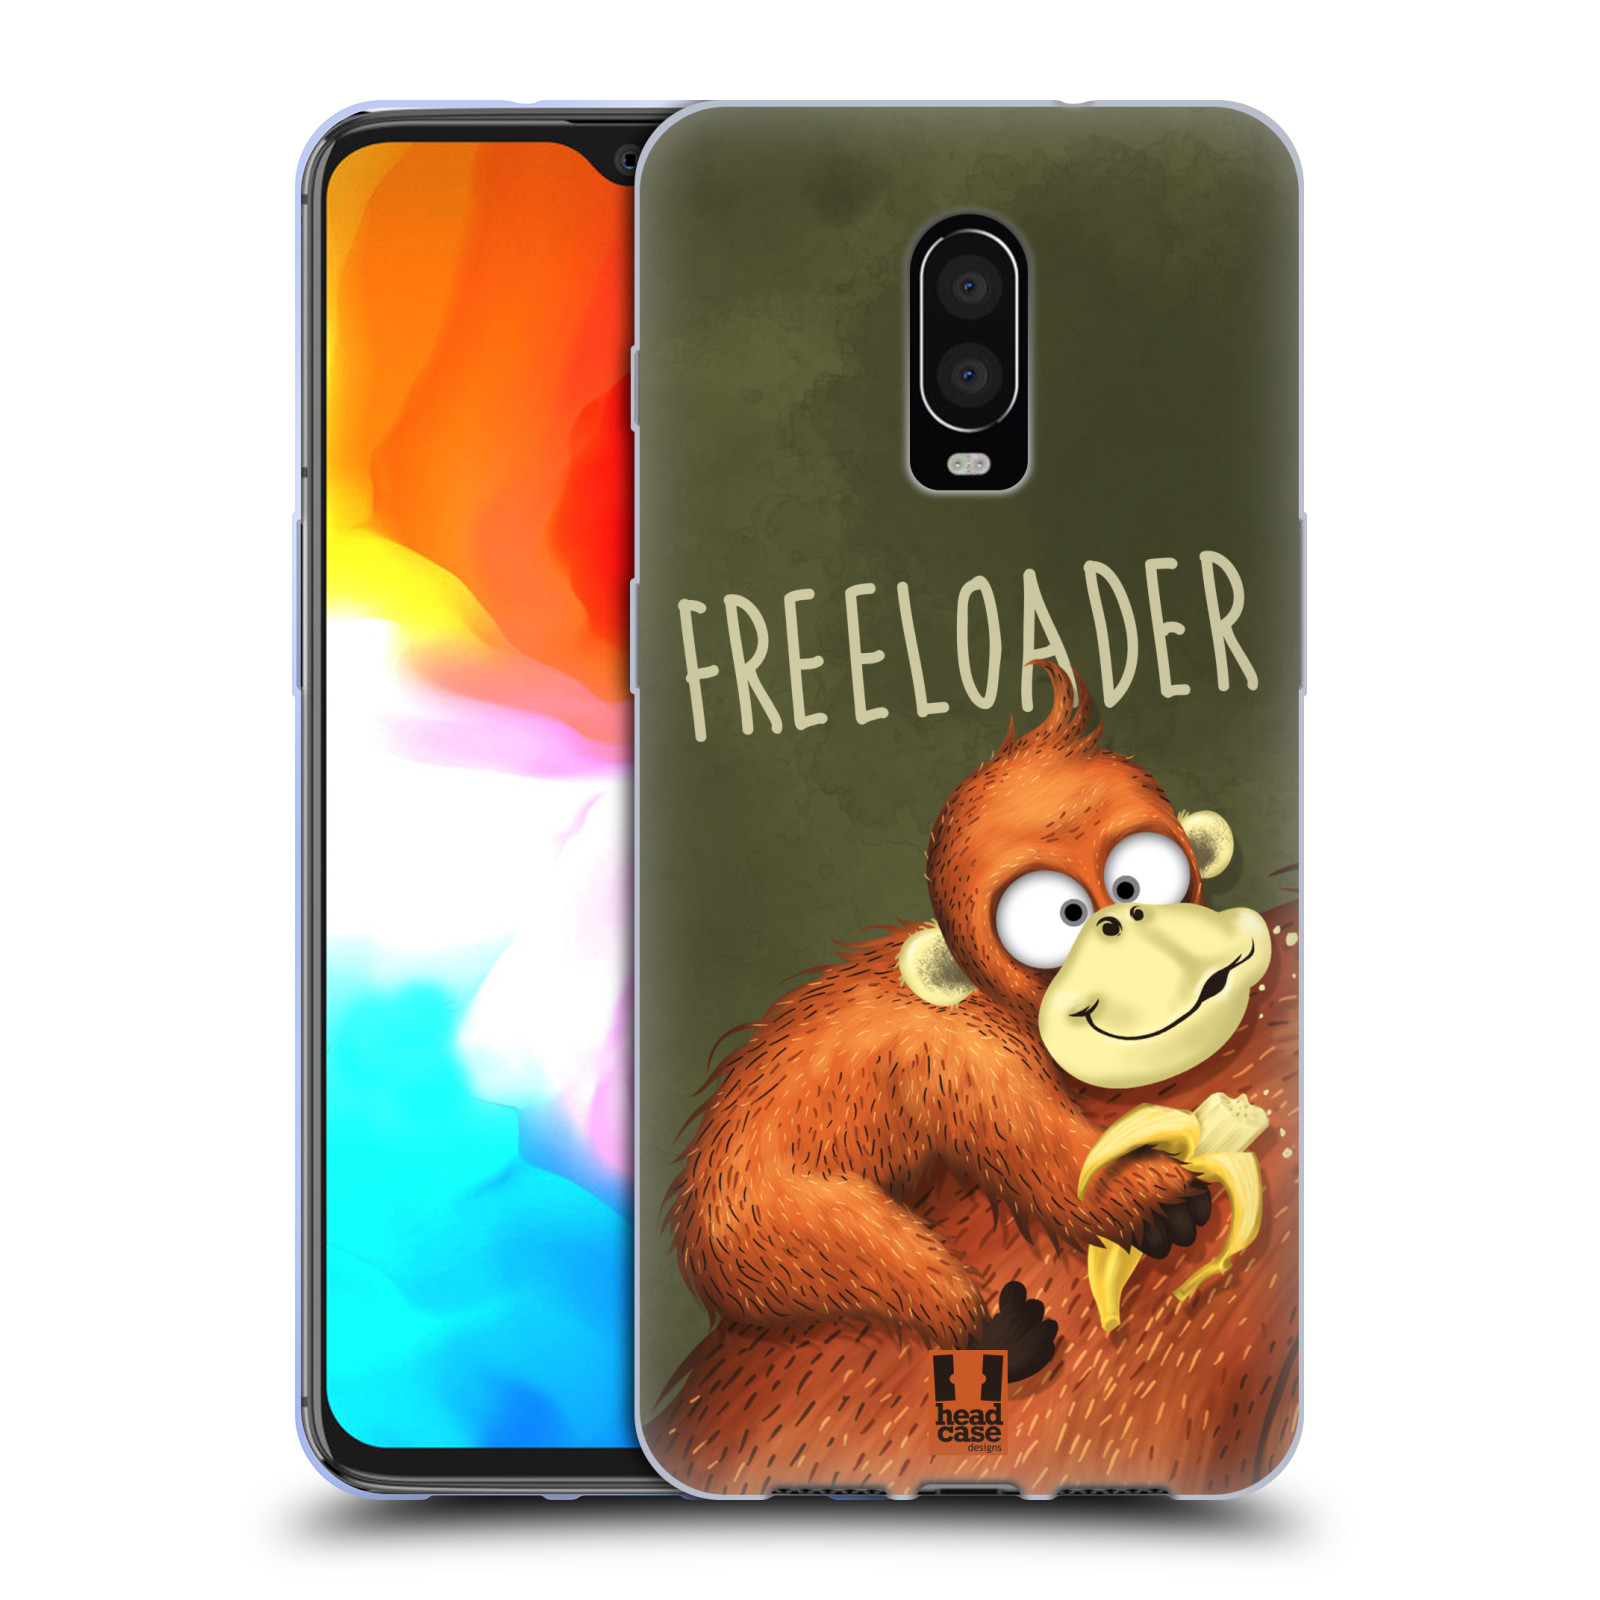 Silikonové pouzdro na mobil OnePlus 6T - Head Case - Opičák Freeloader